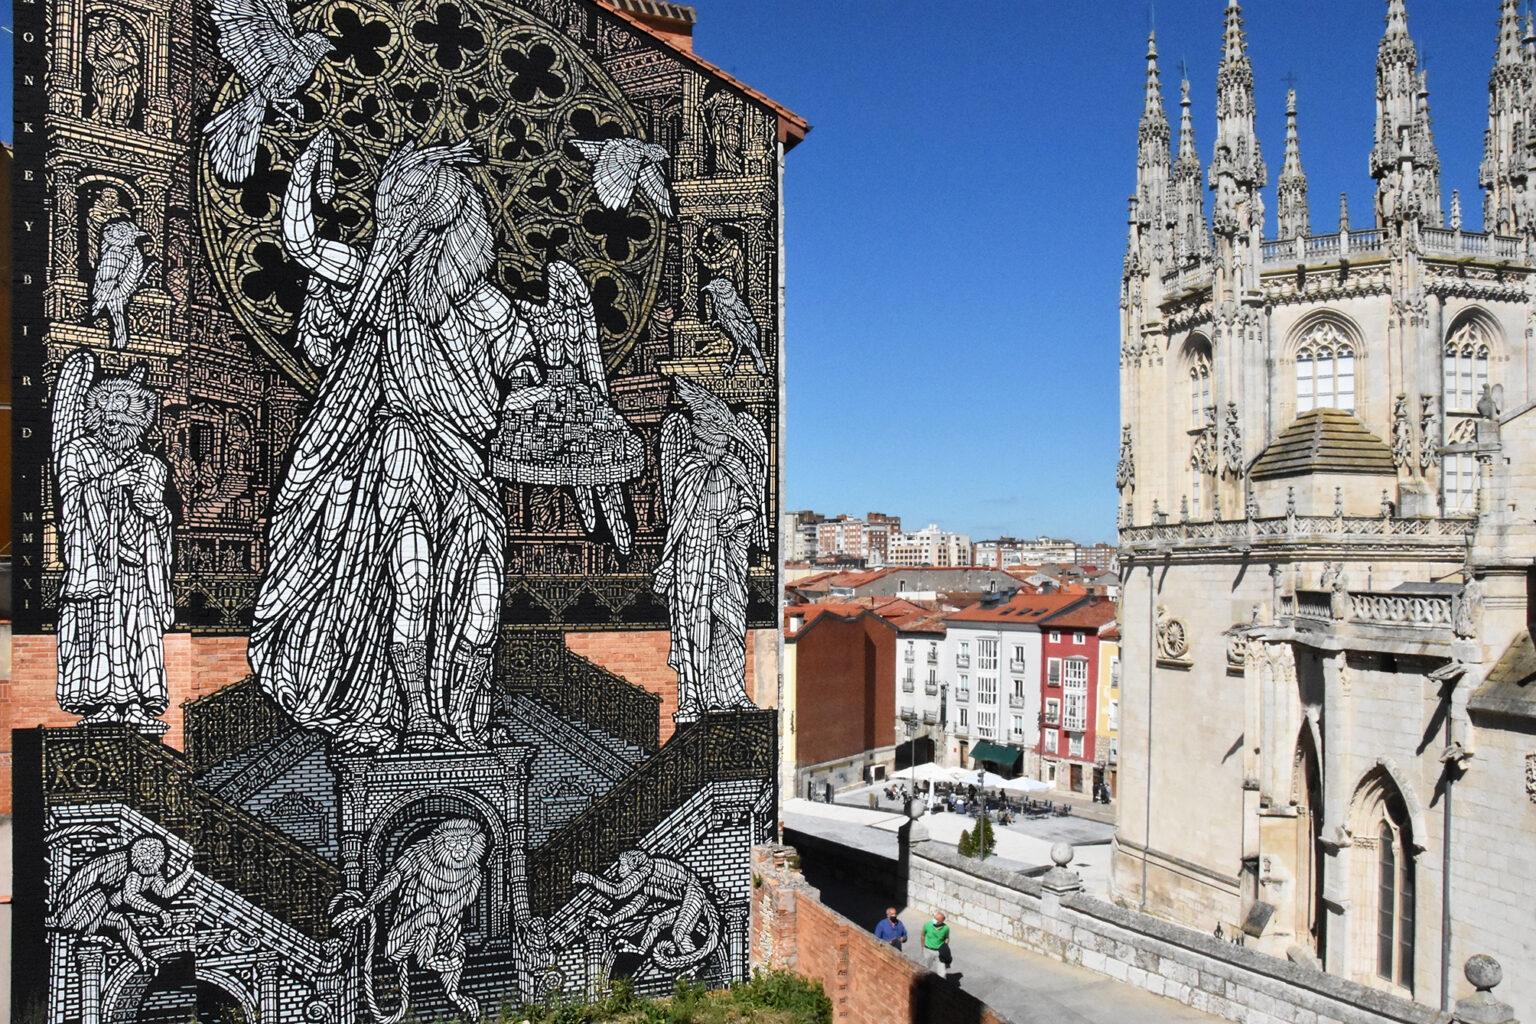 Monumental wall by MONKEYBIRD in Burgos, Spain